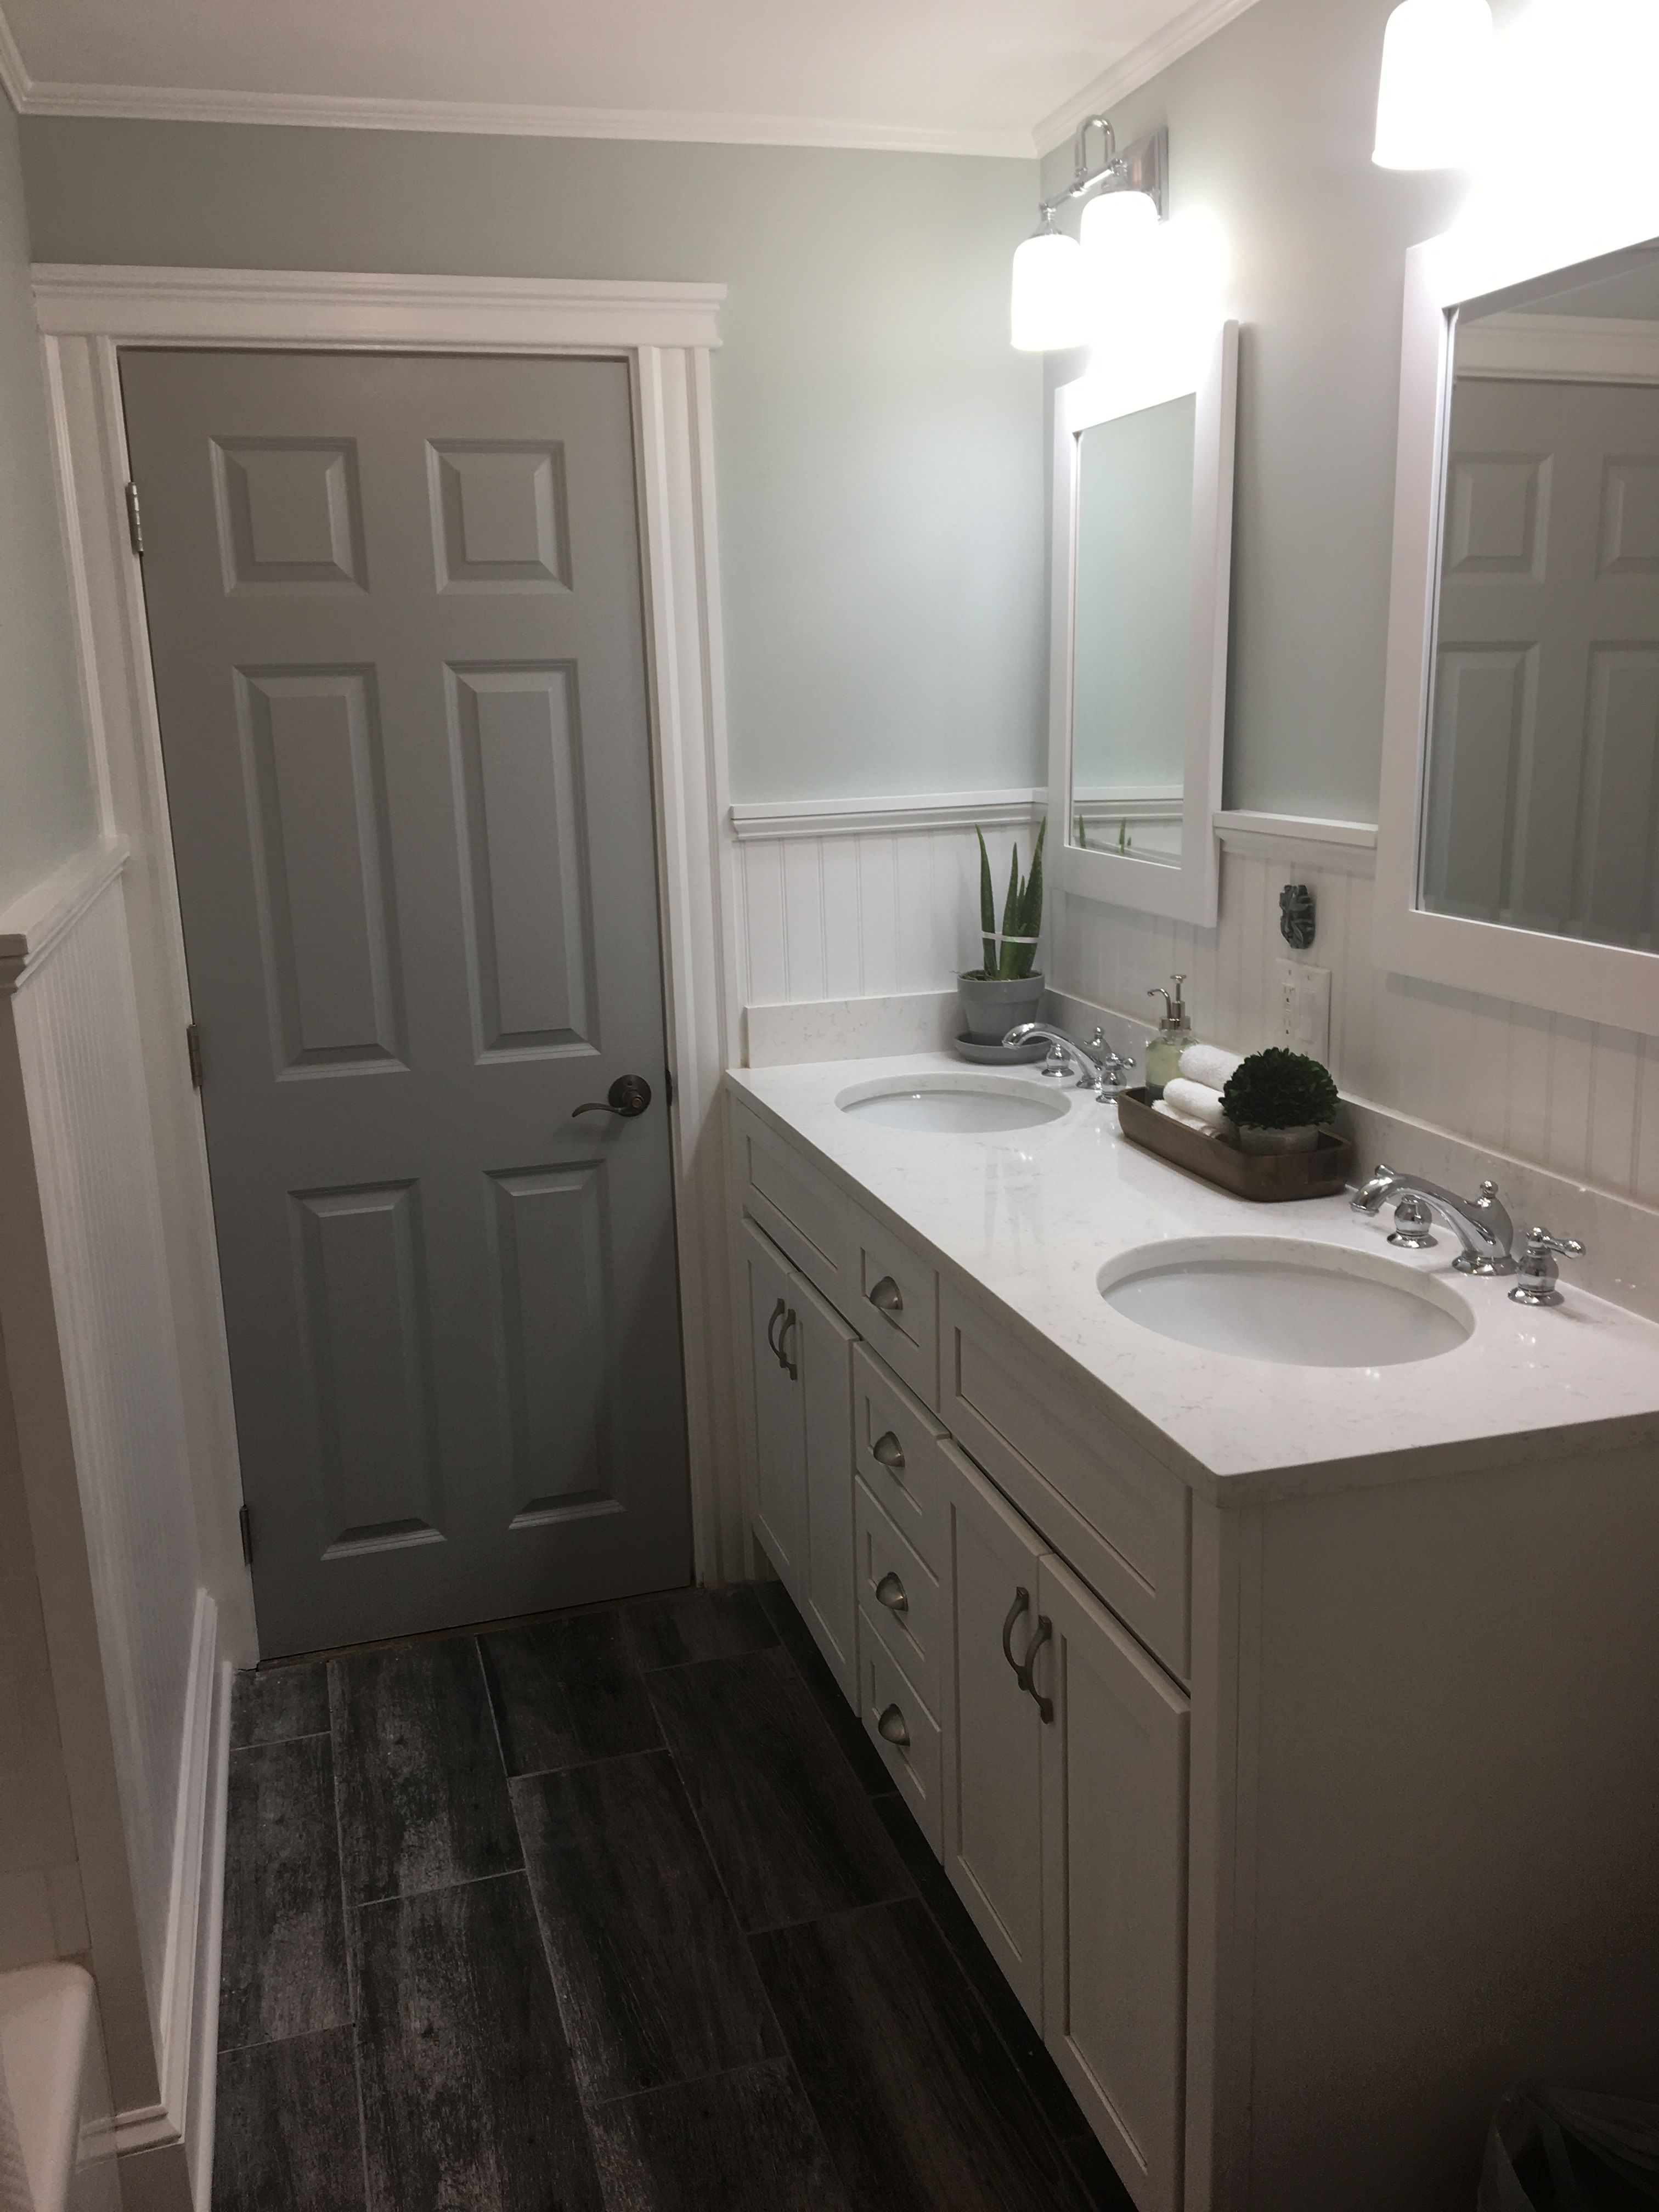 Gray Painted Bathroom Door Behr Classic Silver Bathroom Colors Grey Interior Doors Bathroom Doors